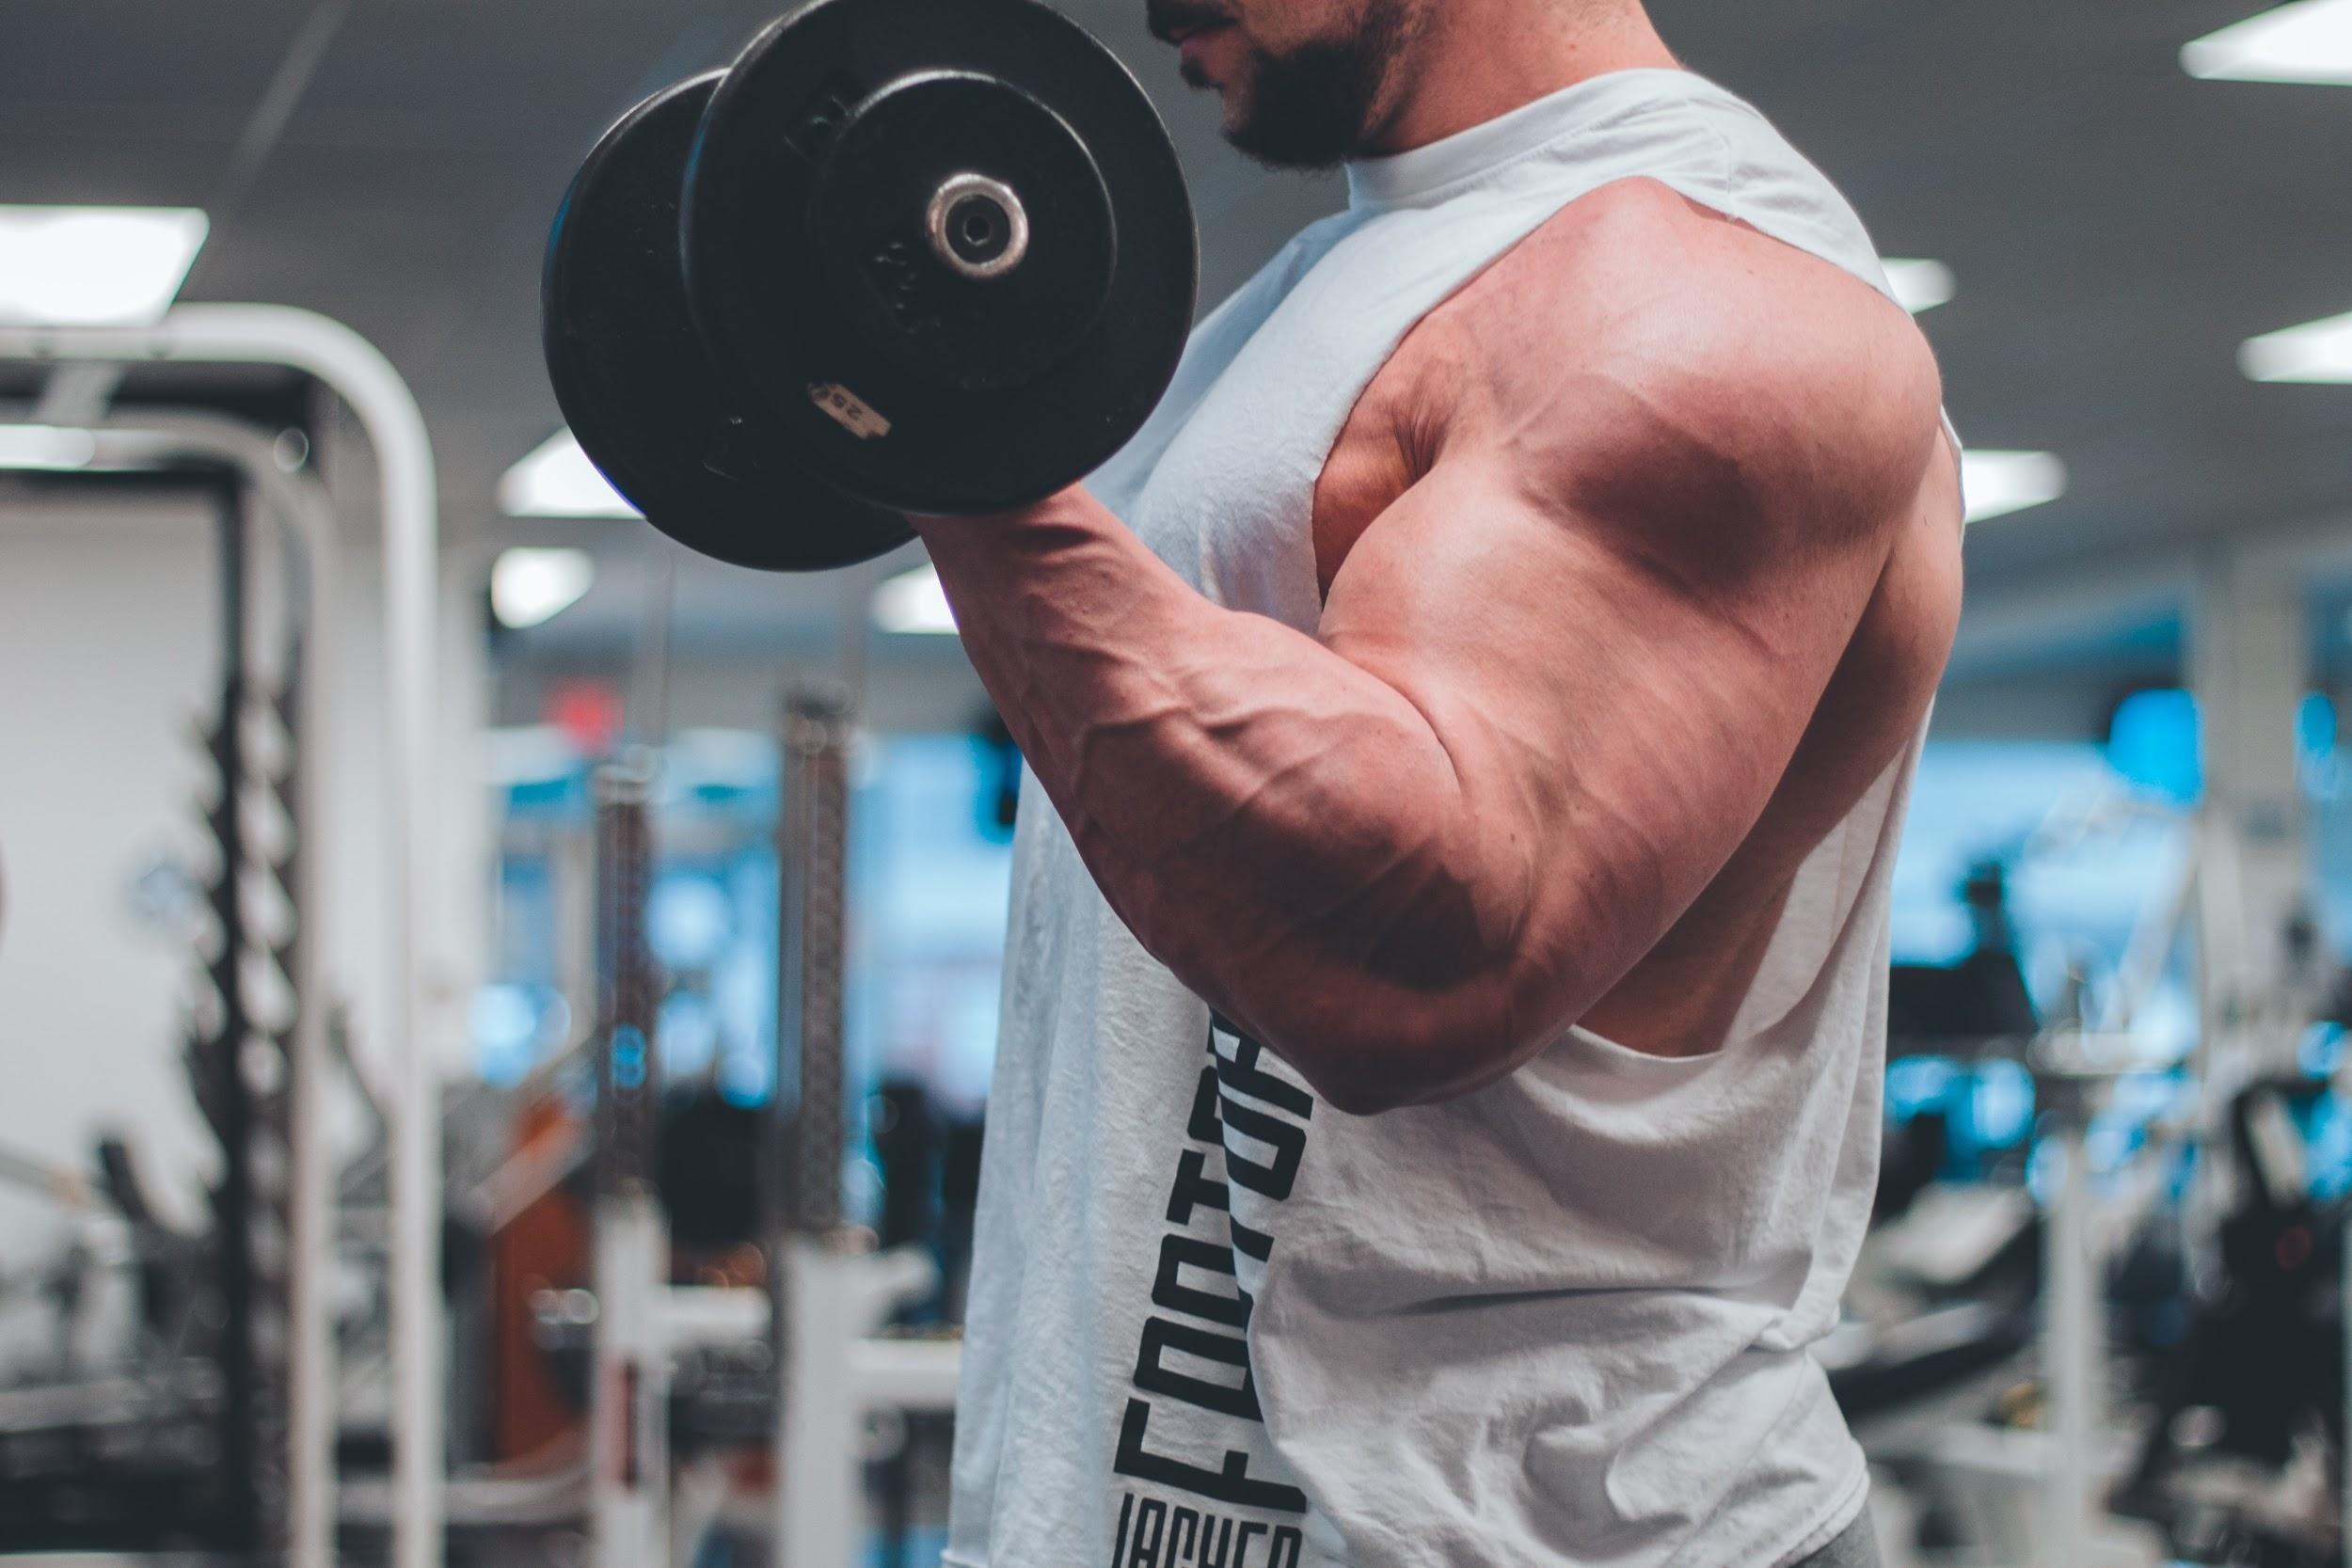 Gentleman's Supplement Guide to Building Muscle